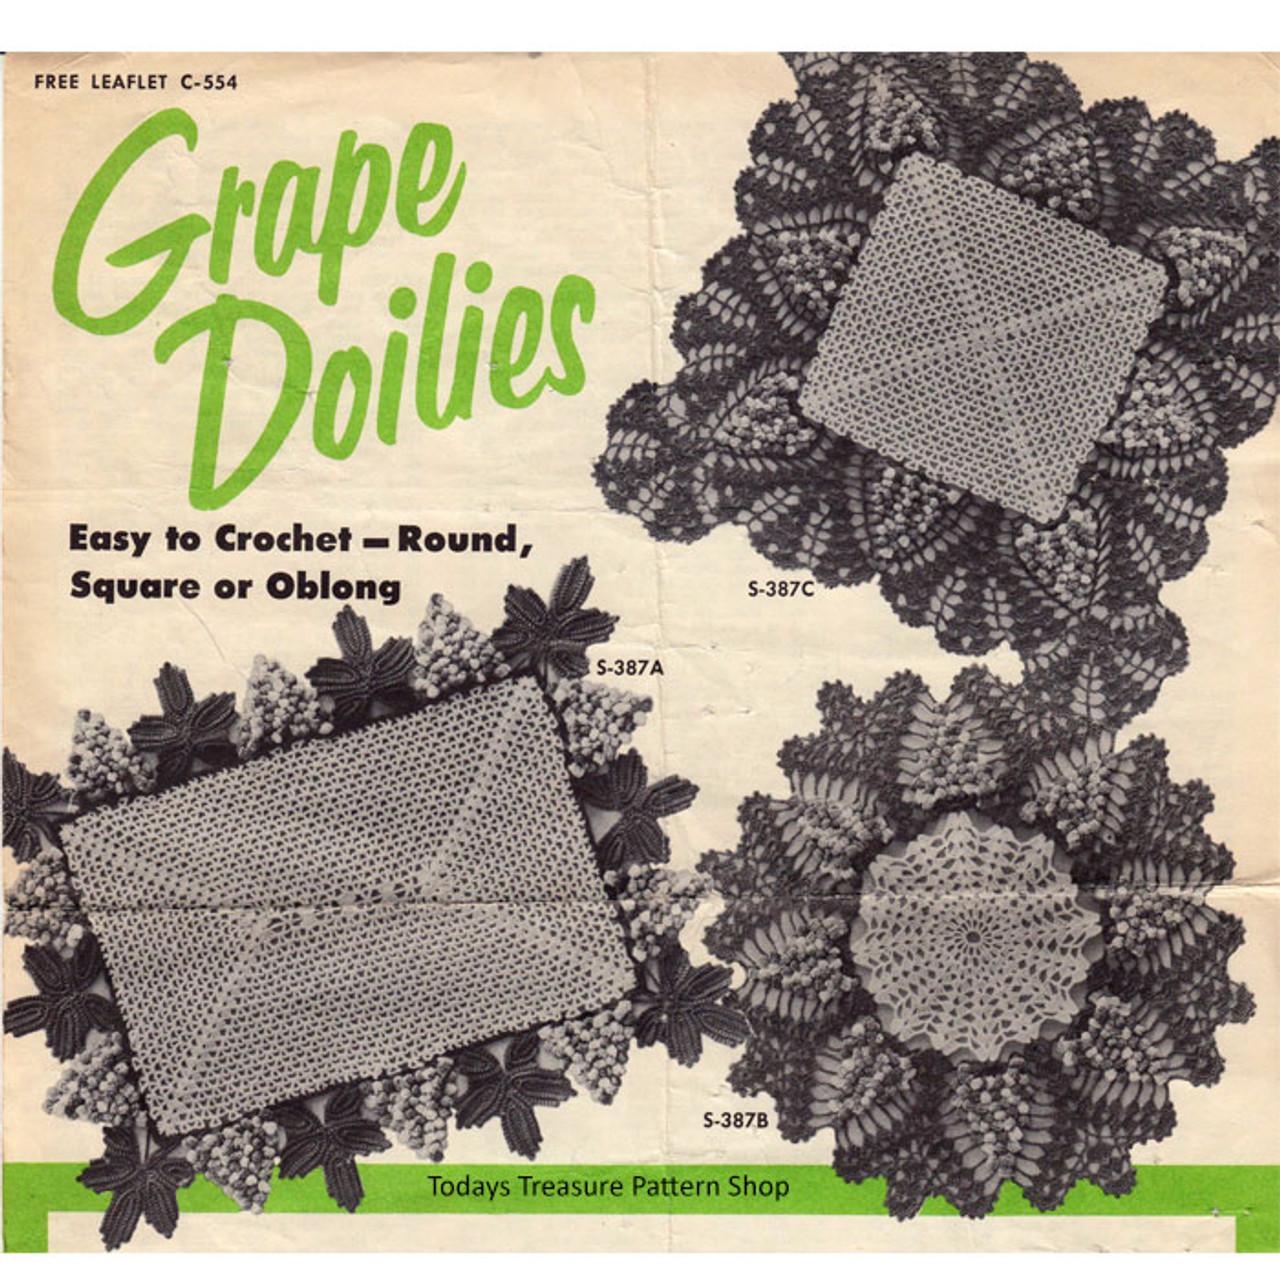 Grape Doily Mats Crochet Pattern, Spool Cotton 554